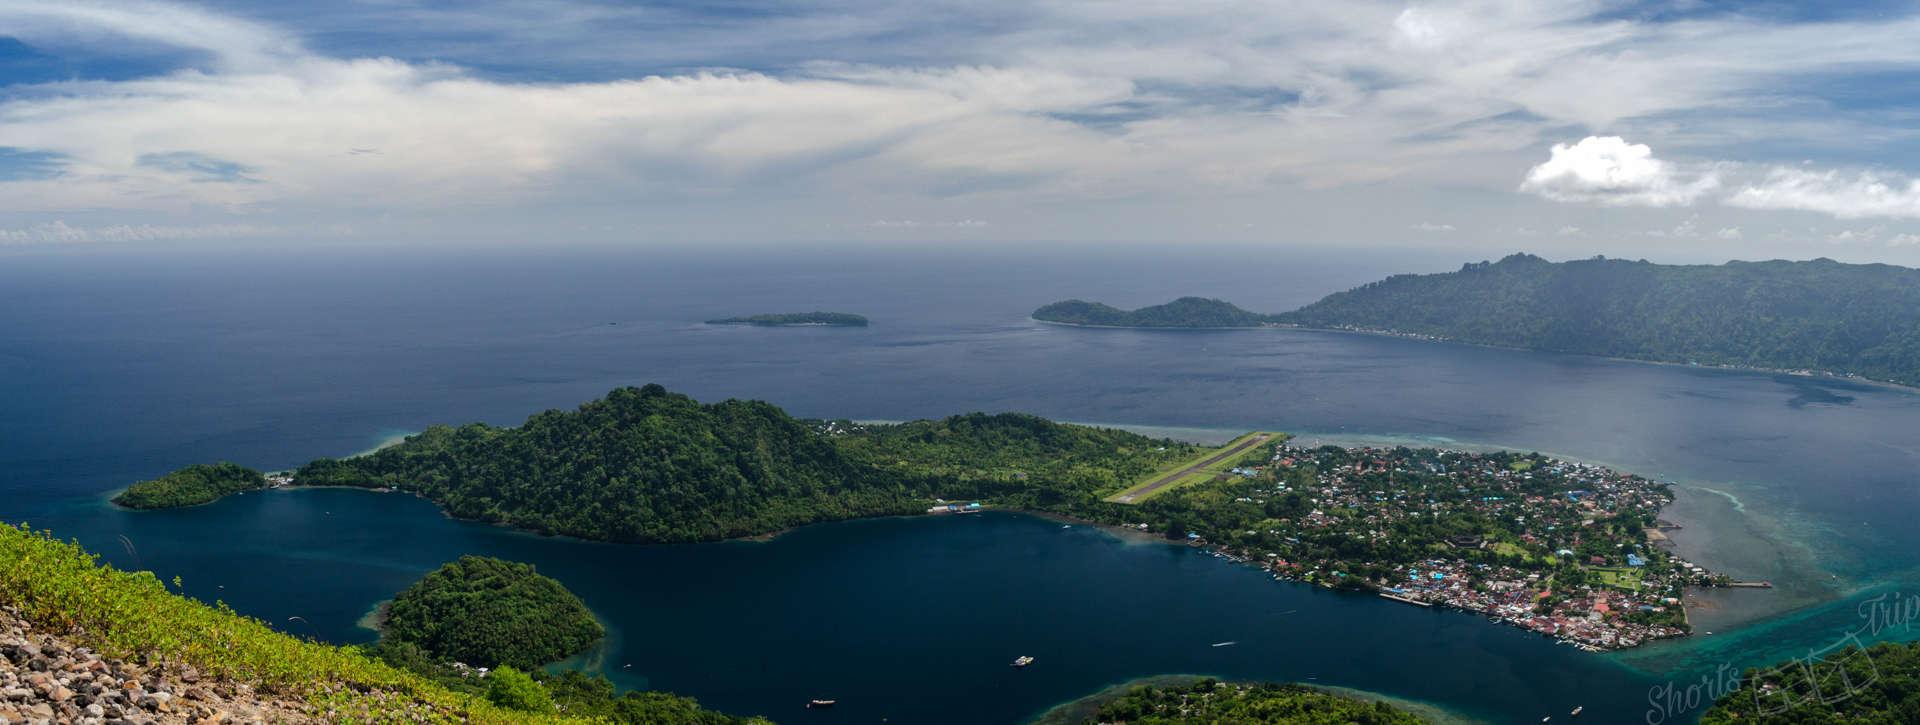 banda neira, banda islands, banda neira airport, pulau api, api island, hike api islands, climb pulau api, how to travel banda islands